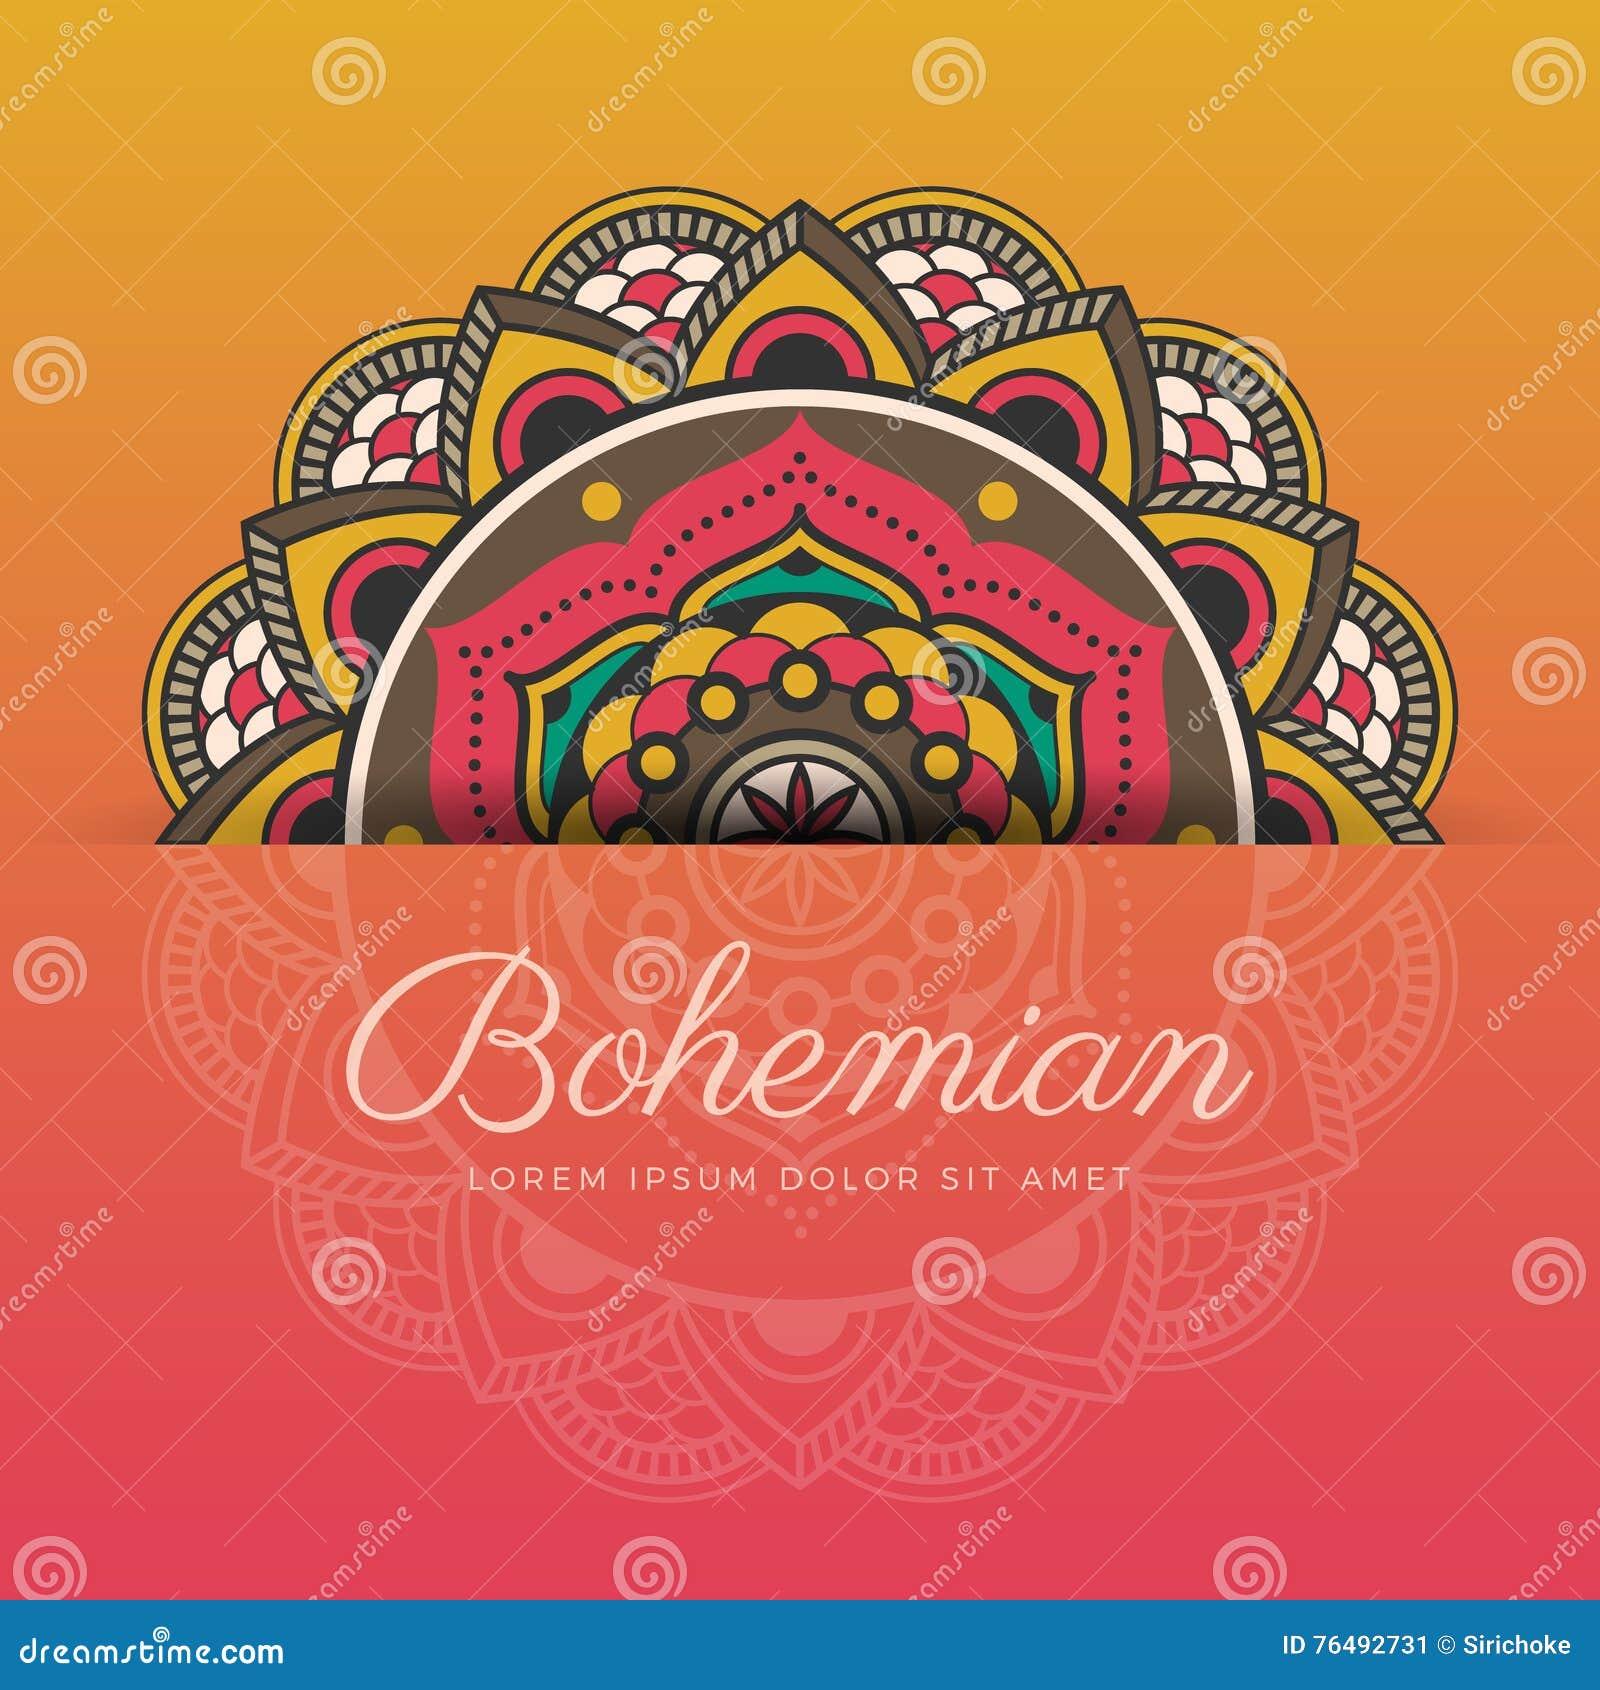 Beautiful Henna Mandala Ornament Design Stock Vector Illustration